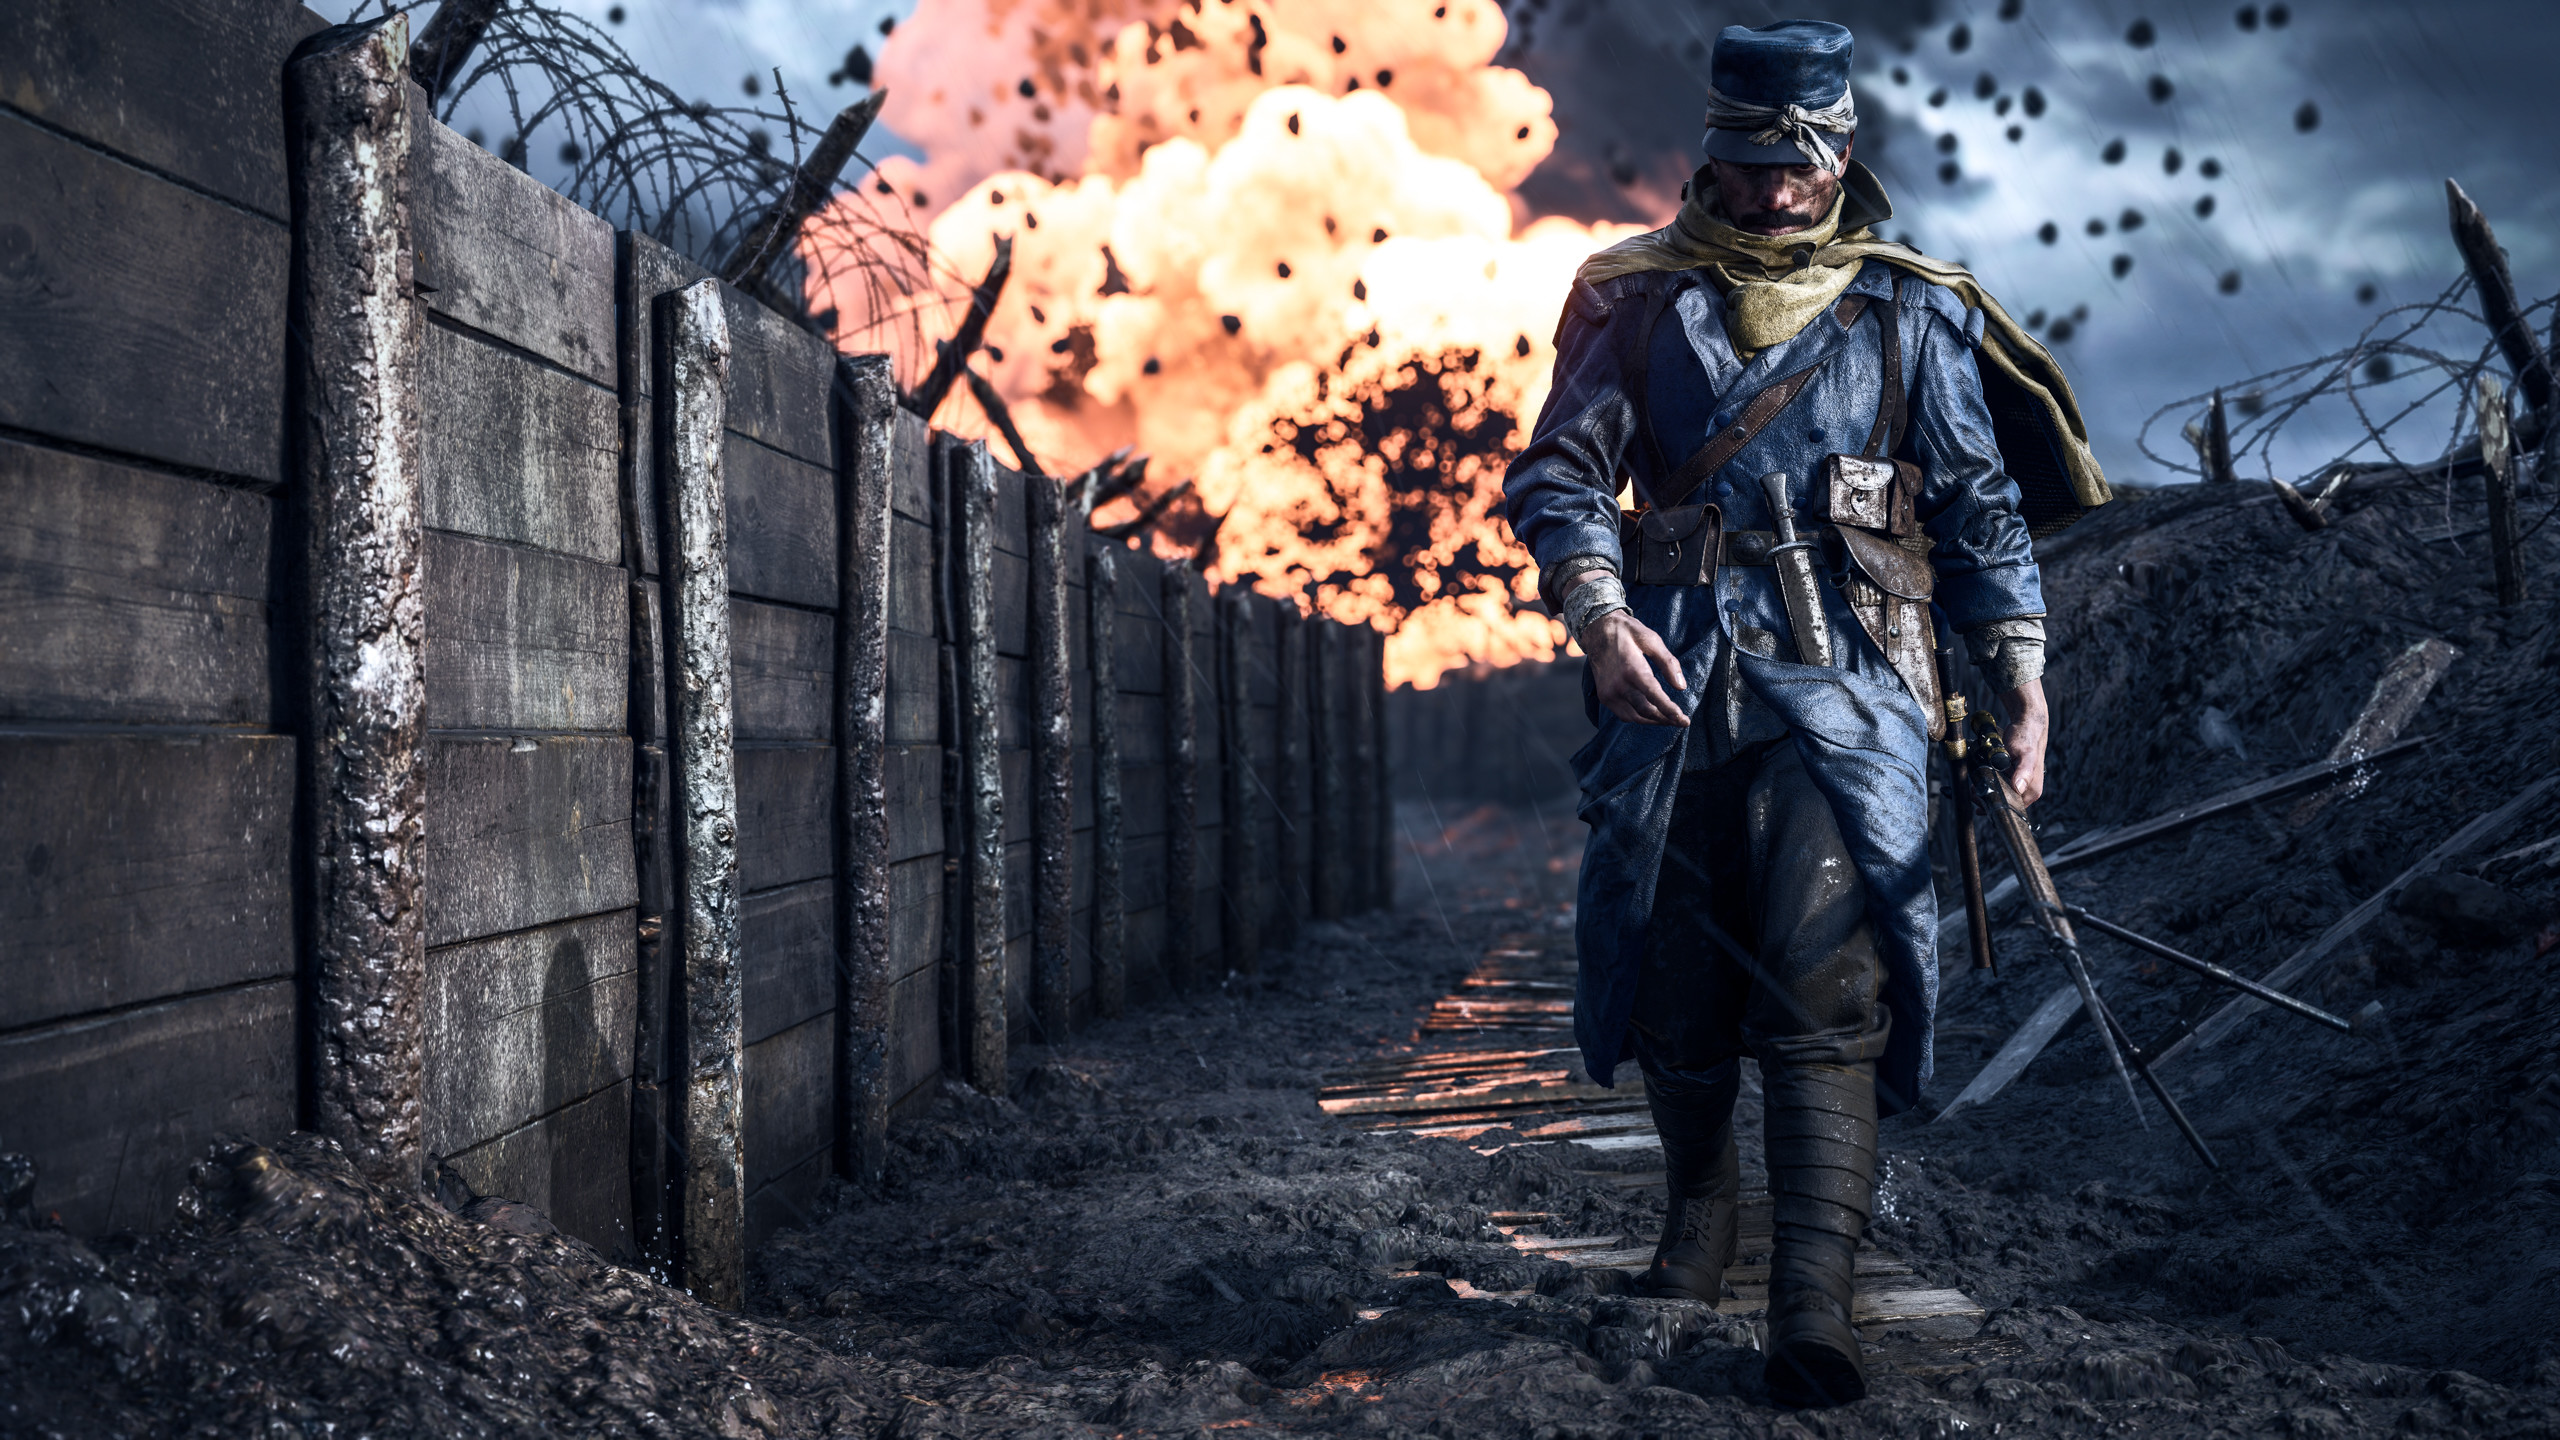 Battlefield 1 Wallpaper (72+ images)